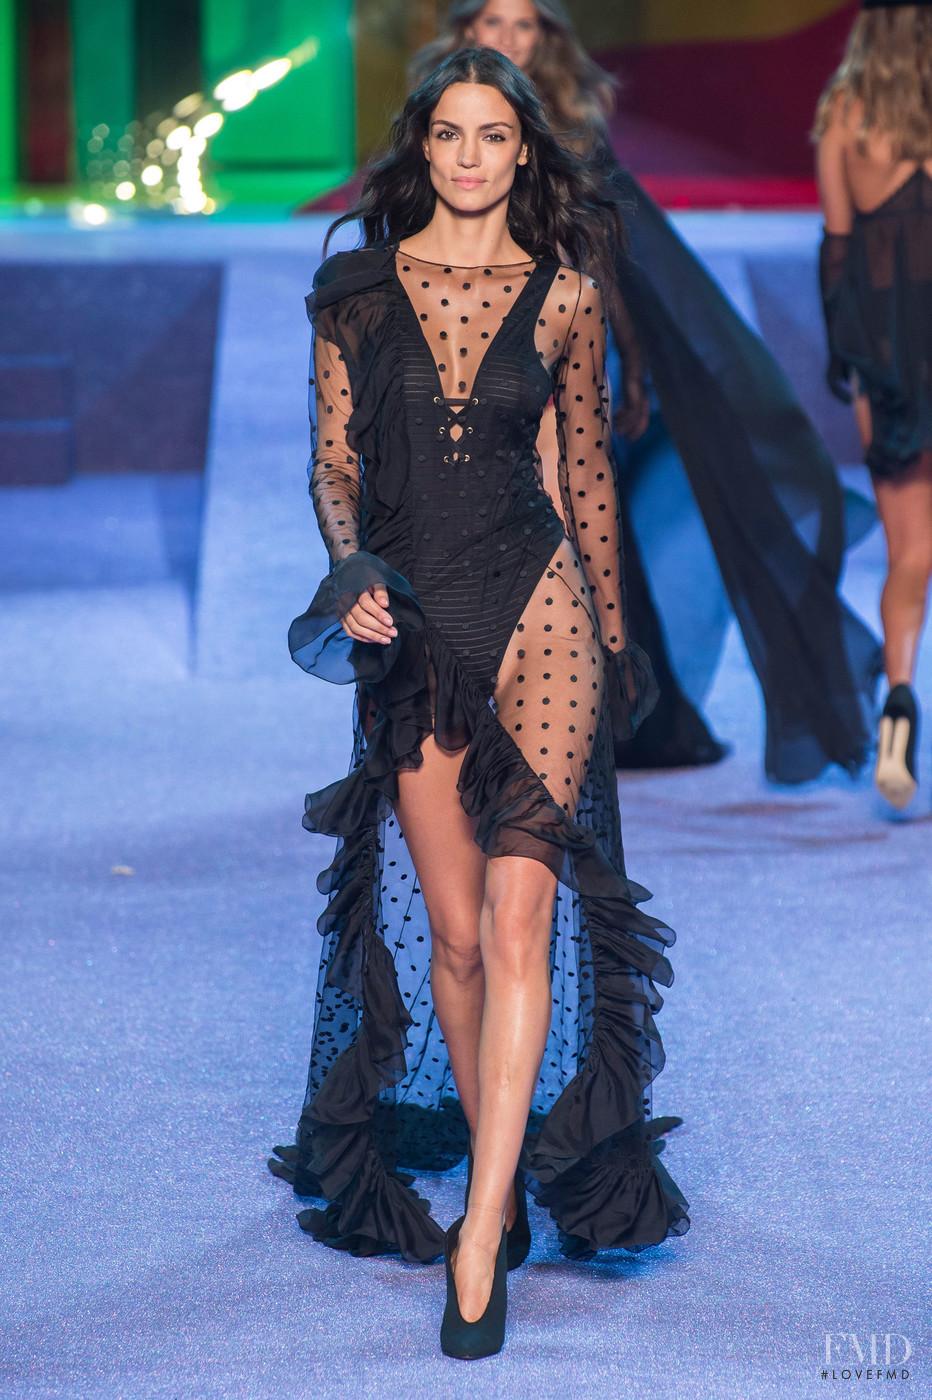 Photo - Etam - Spring/Summer 2019 Ready-to-Wear - paris - Fashion Show | Brands | The FMD